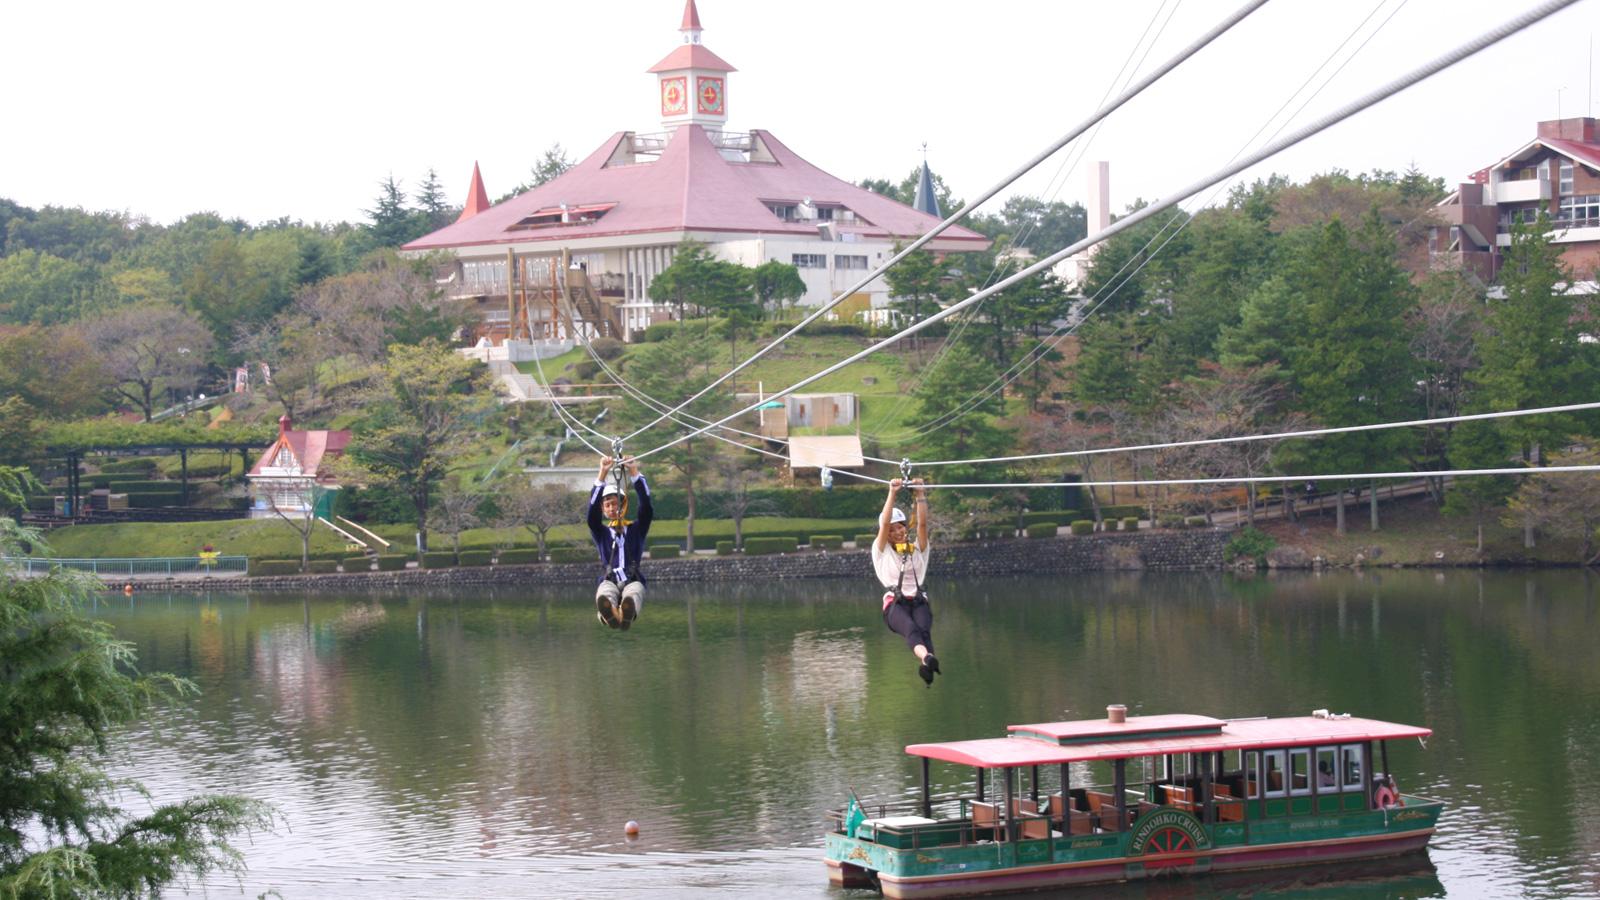 photo by 那須りんどう湖レイクビュー公式HP